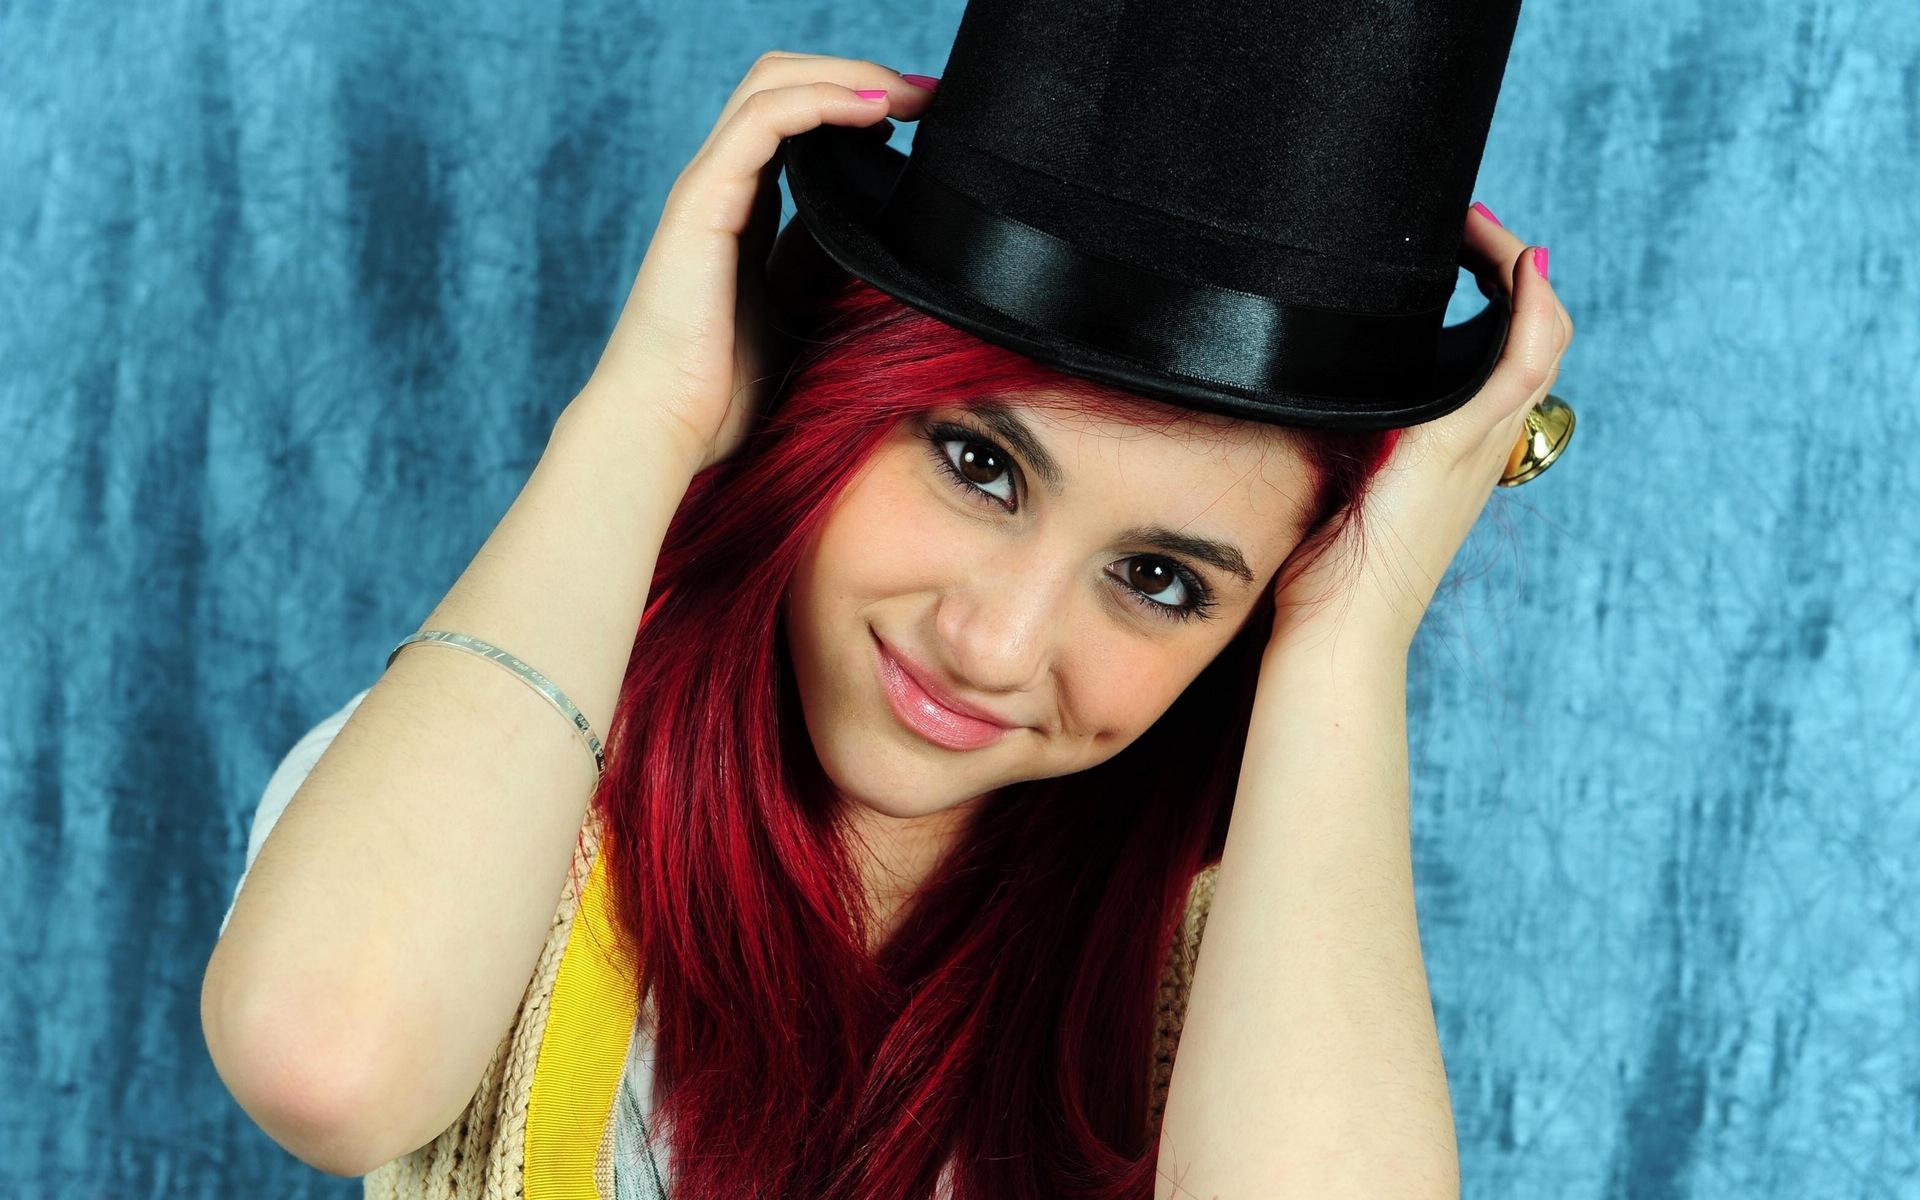 Cute Ariana Grande Wallpaper